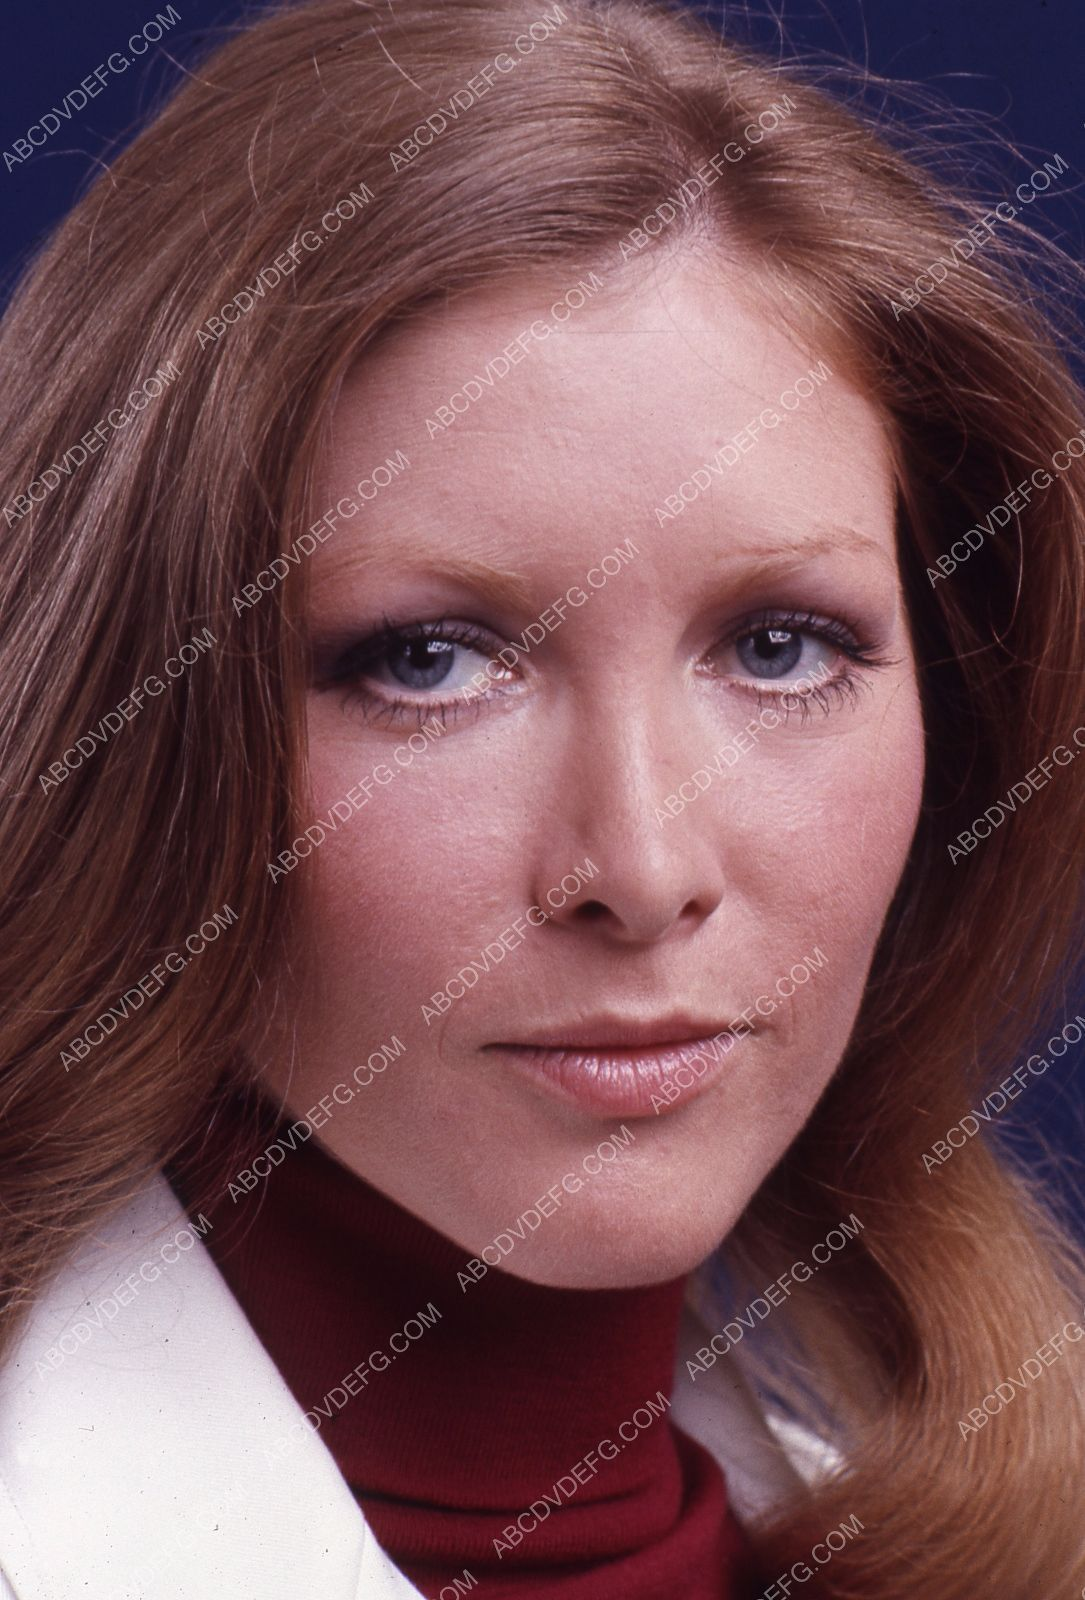 Susan Howard born January 28, 1944 (age 74)